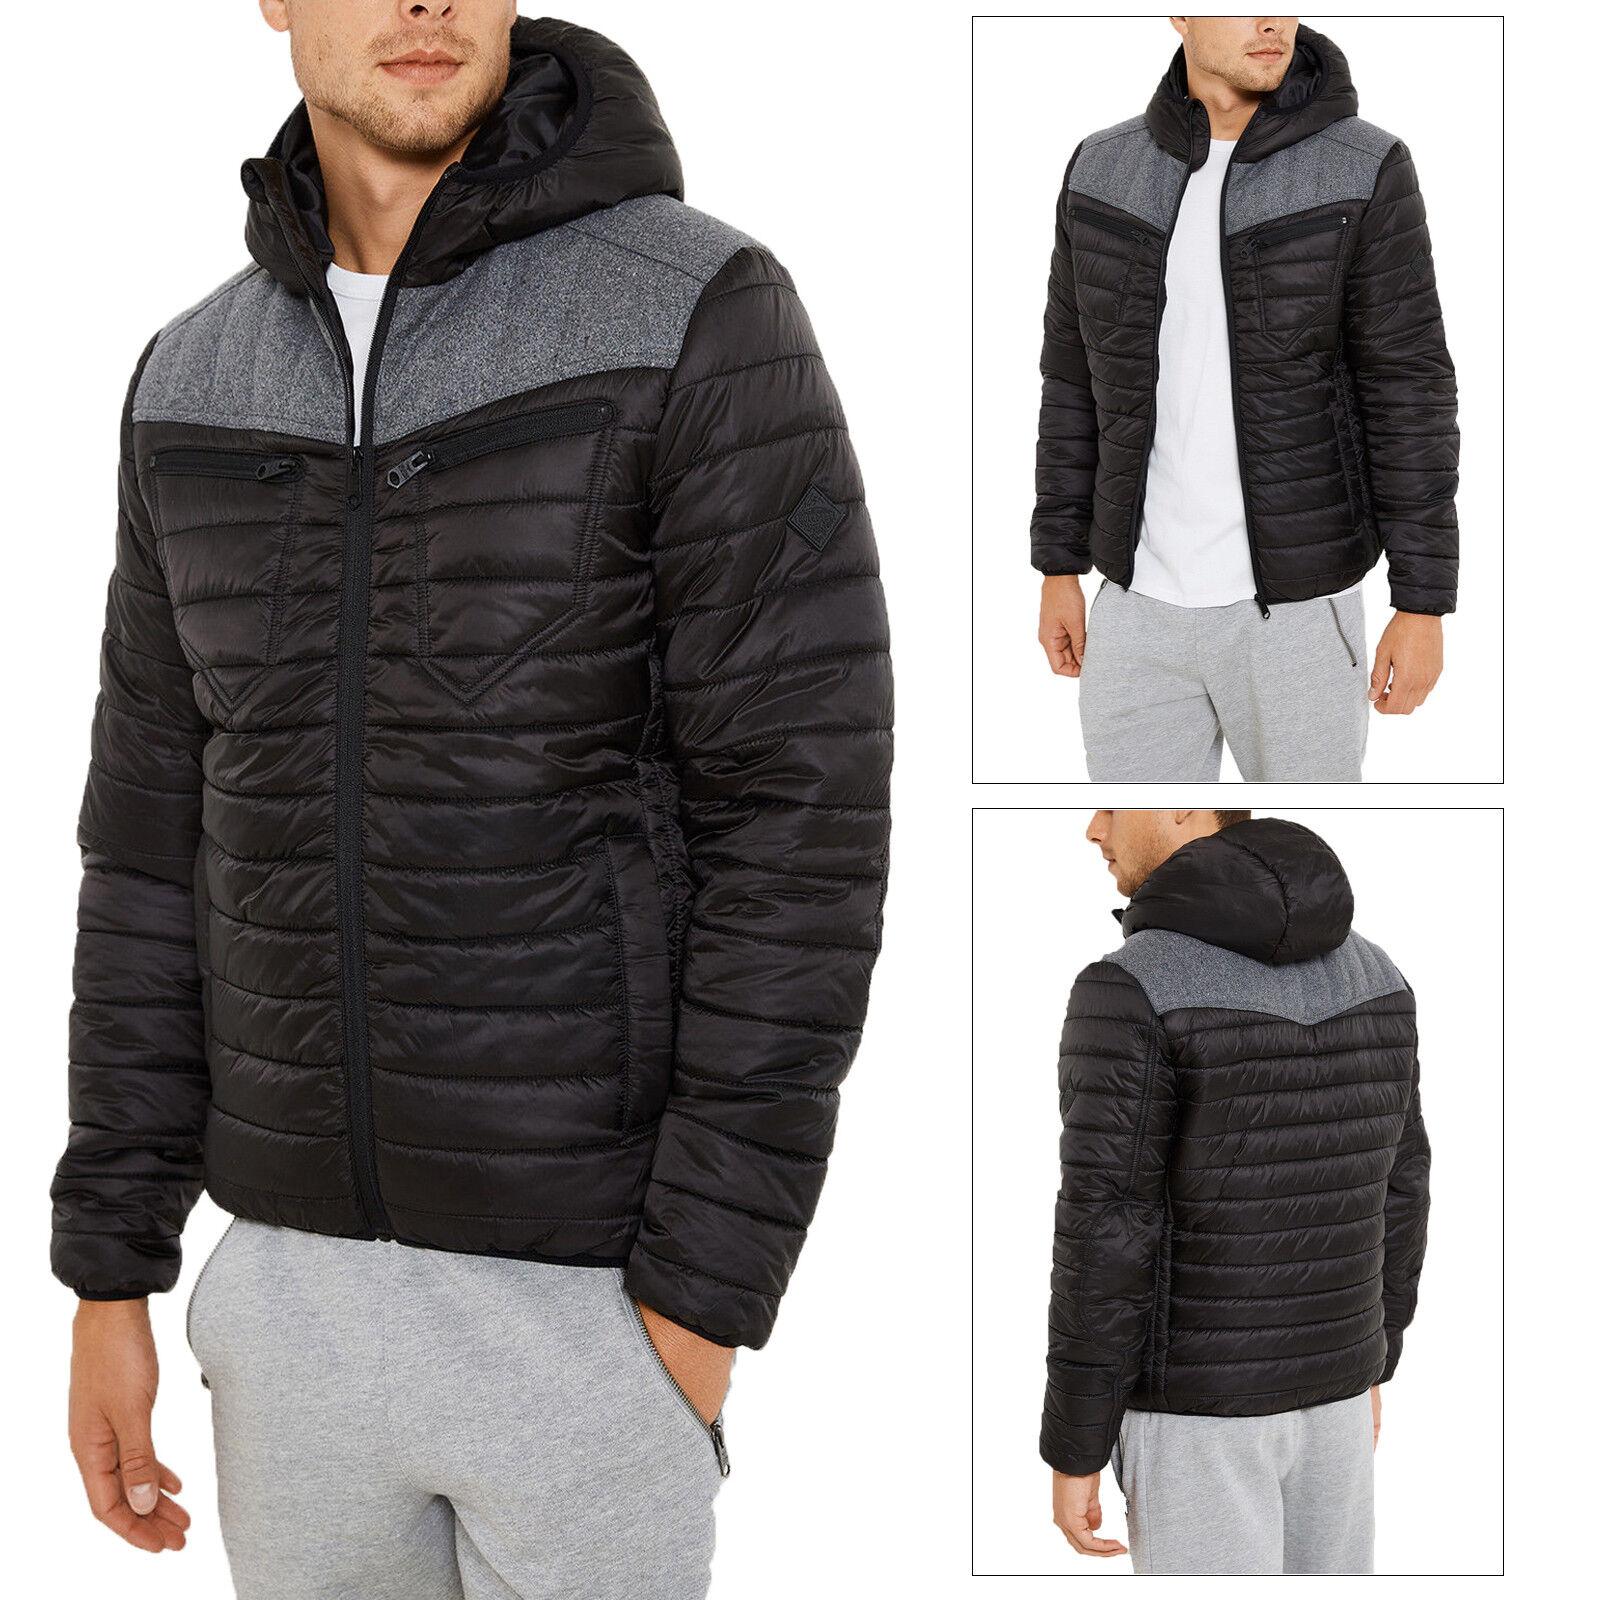 Threadbare Mens Designer Lightweight Quilted Rain Resistant Hooded Padded Jacket